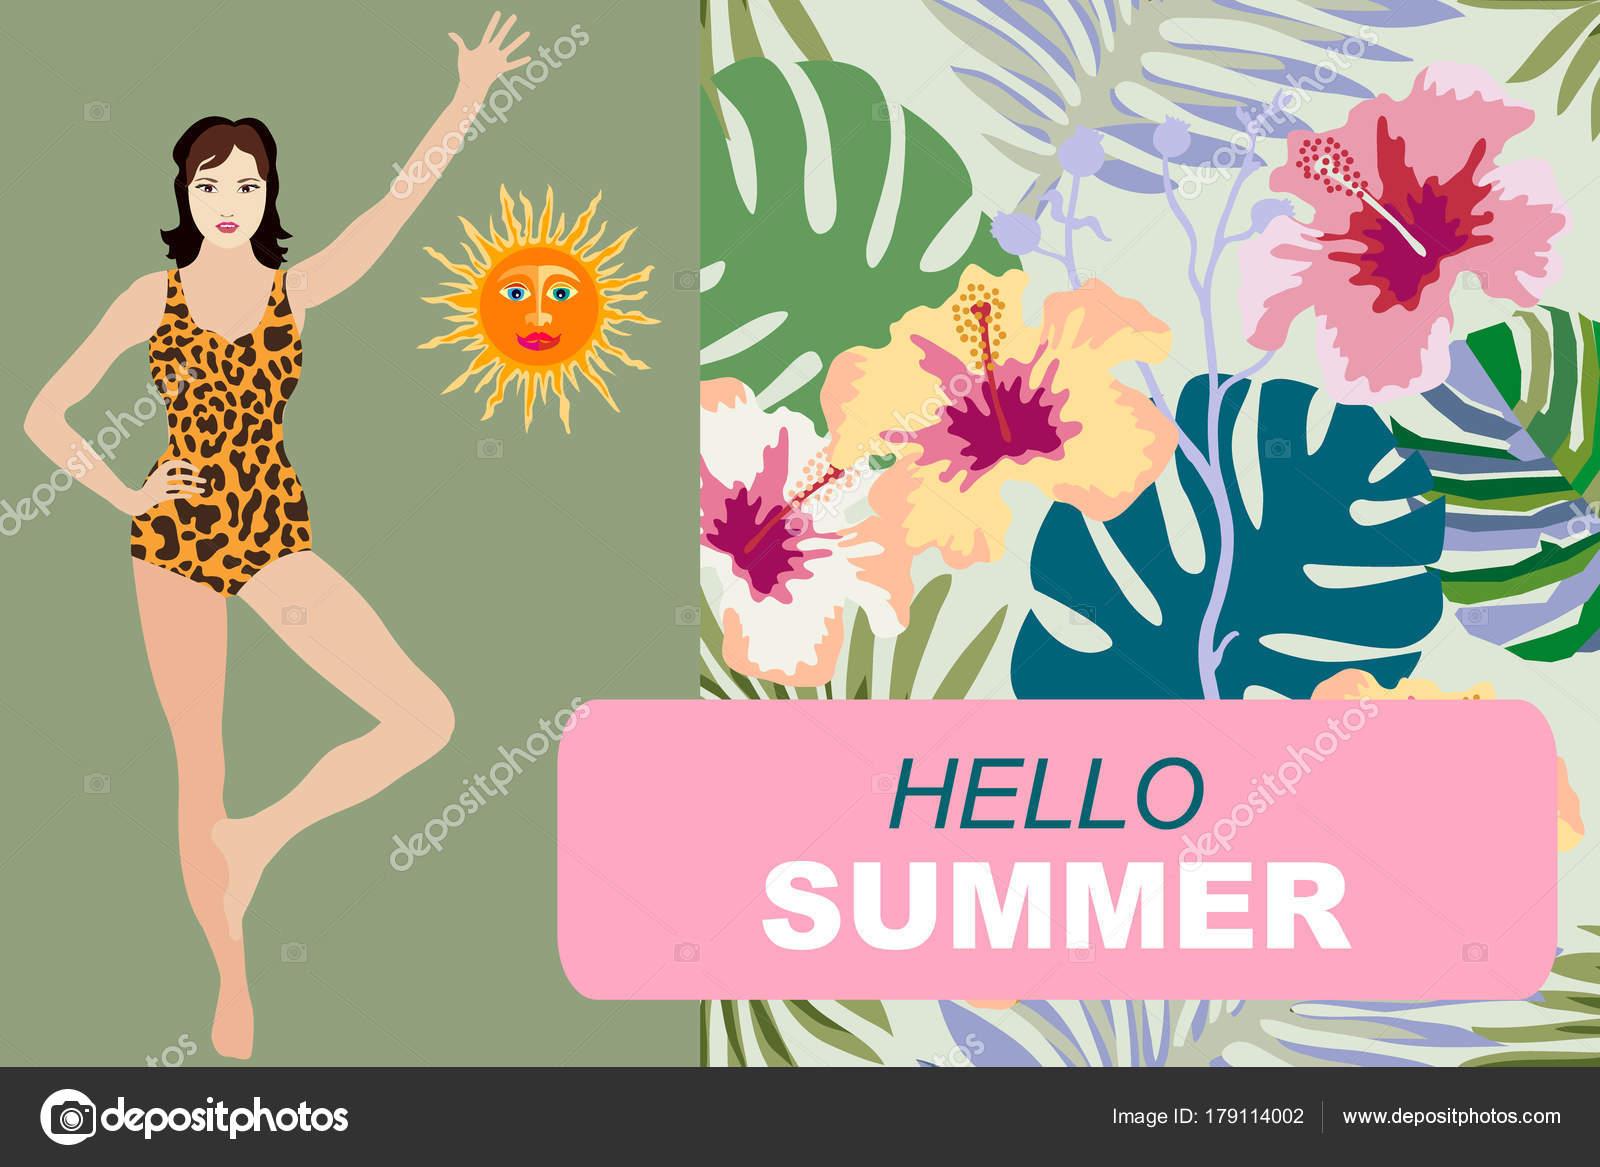 Design For Covers, Posters, Cards And Invitations. U2014 Vector By  SvetlanaKononova